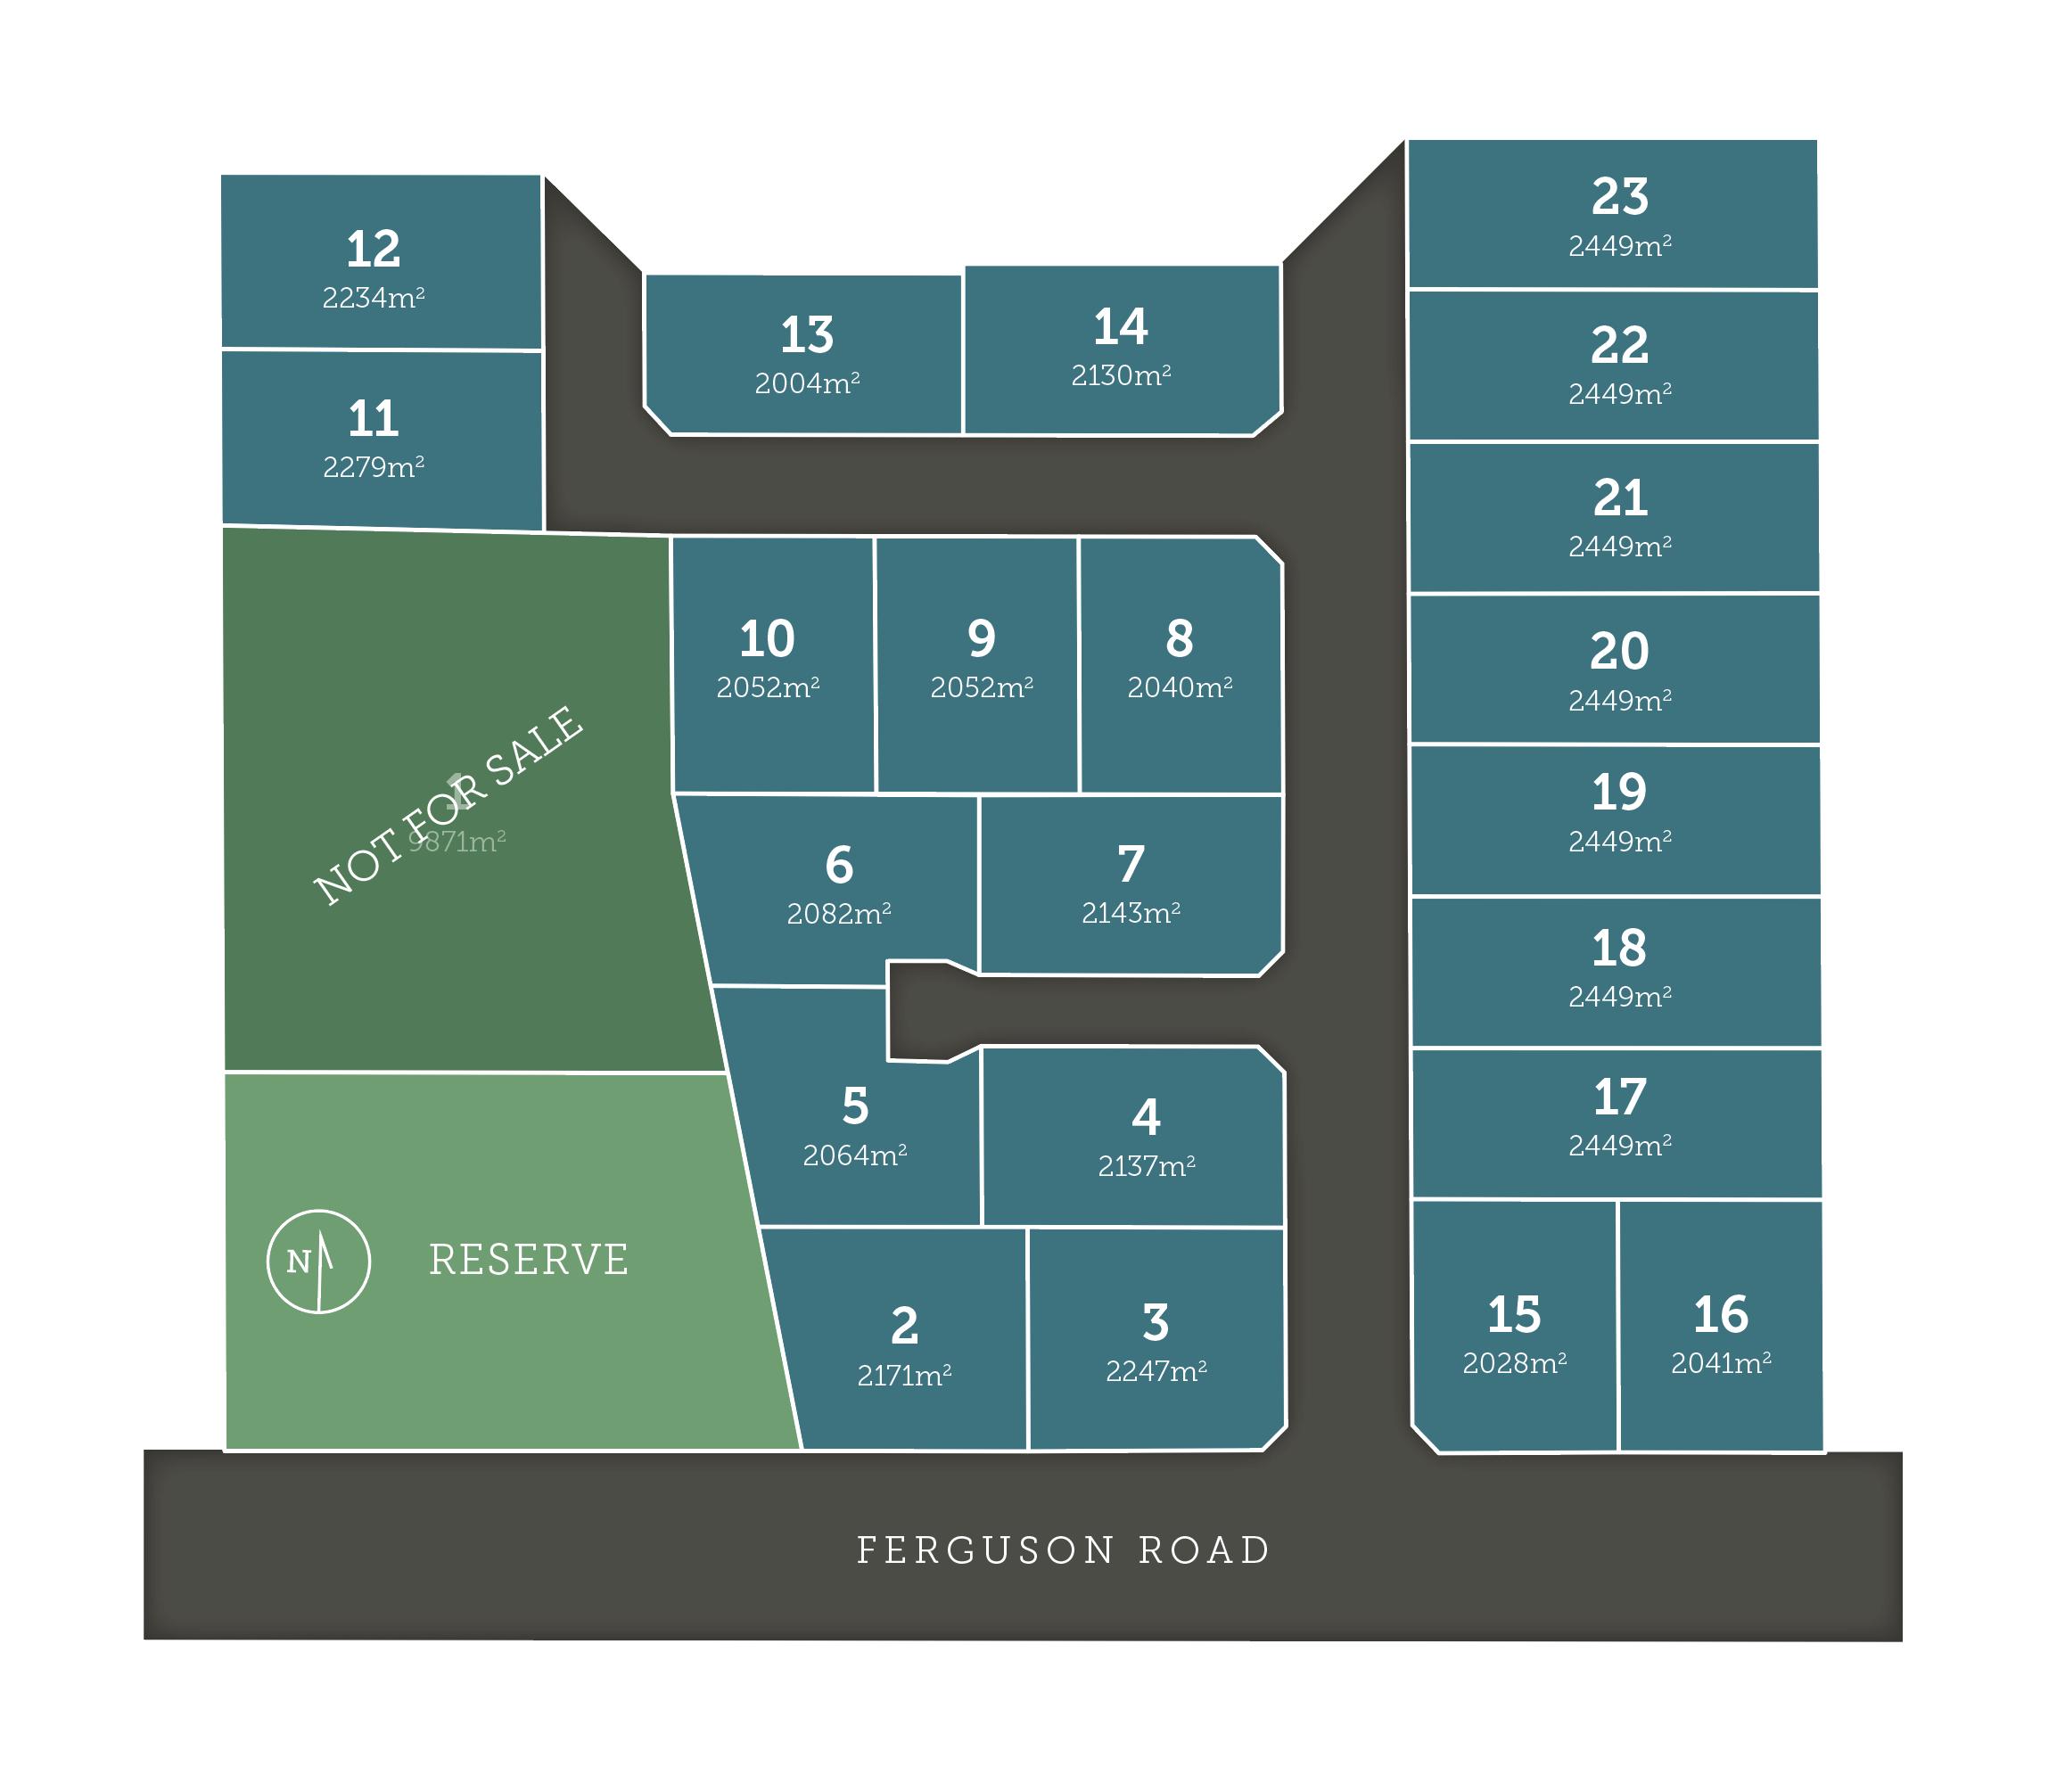 Stage 1 Development Plan - Updated design for presentation